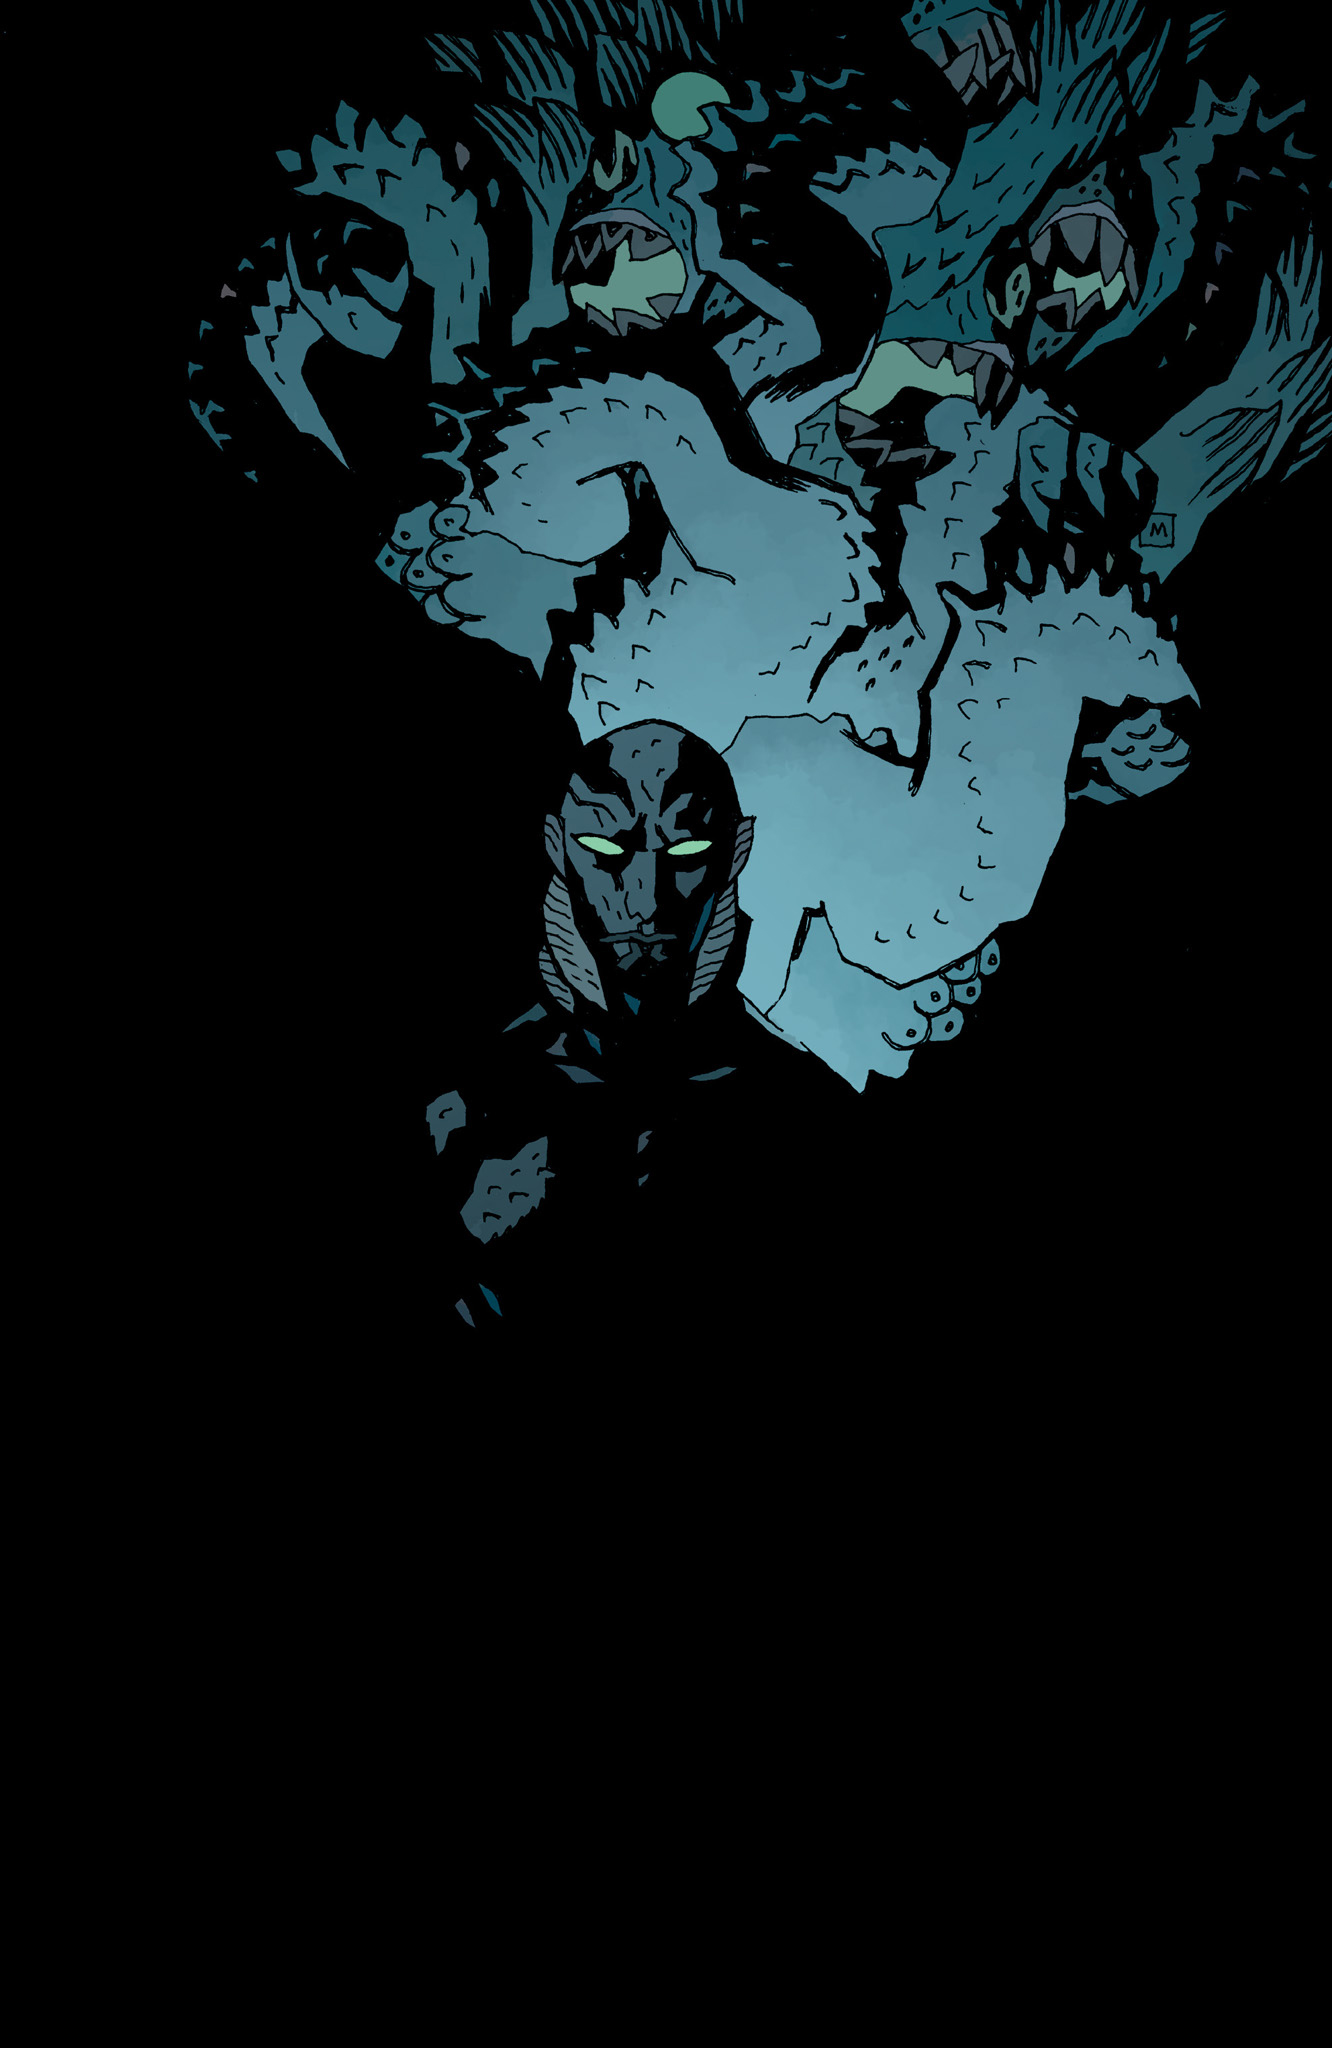 King of Fear   Hellboy Wiki   FANDOM powered by Wikia